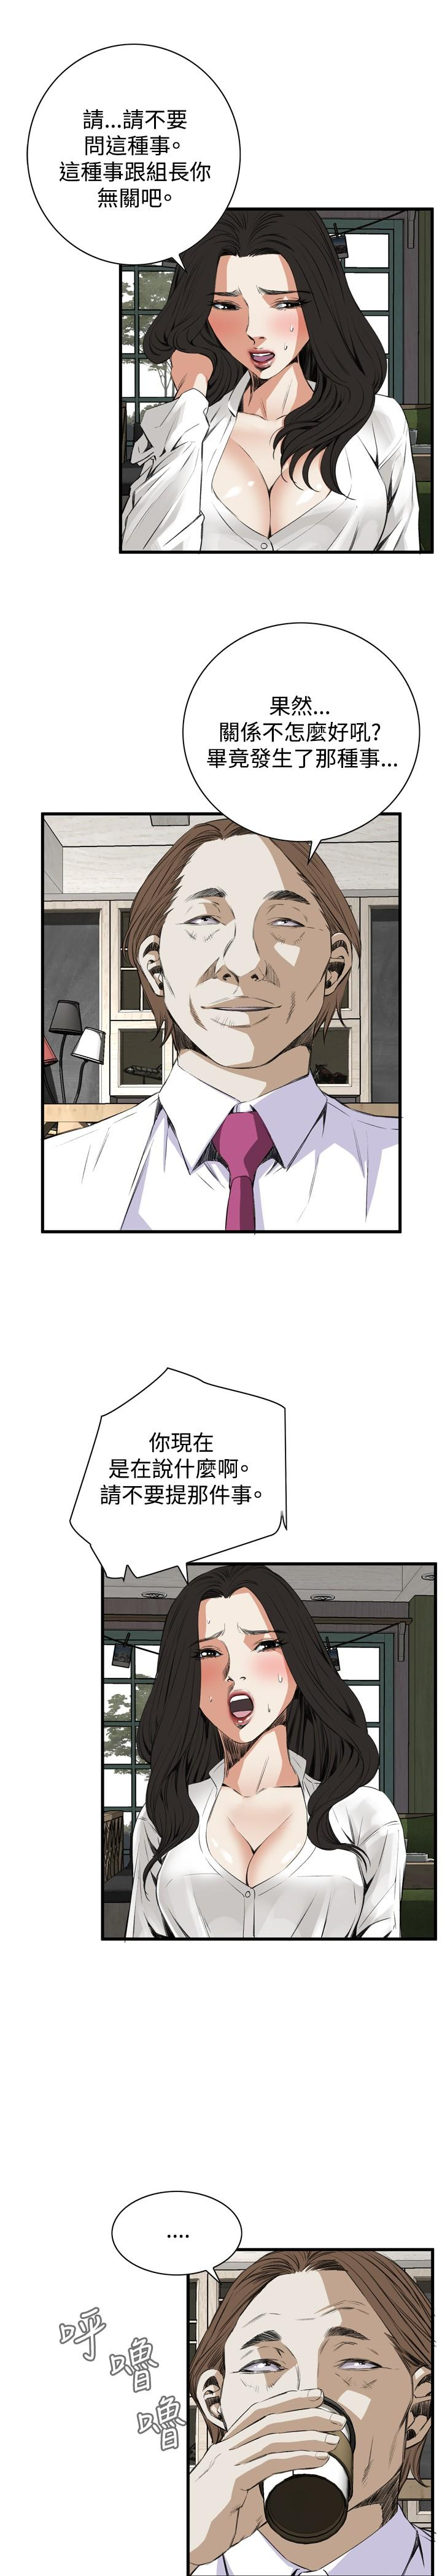 Take a Peek 偷窥 Ch.39~60 [Chinese]中文 264